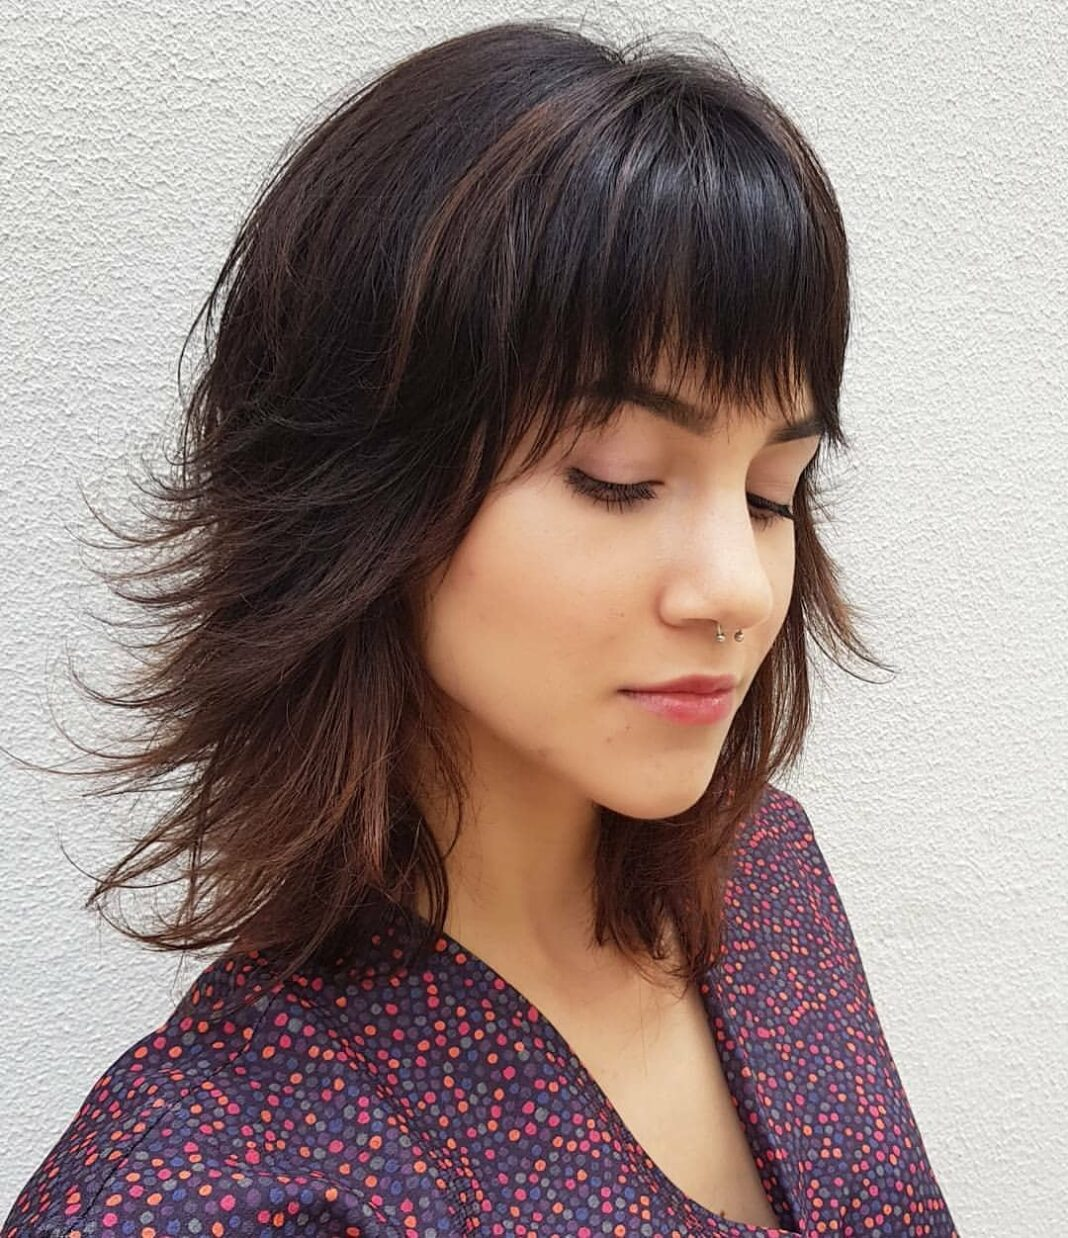 Medium Hairstyles With Bangs 2019 Female 47